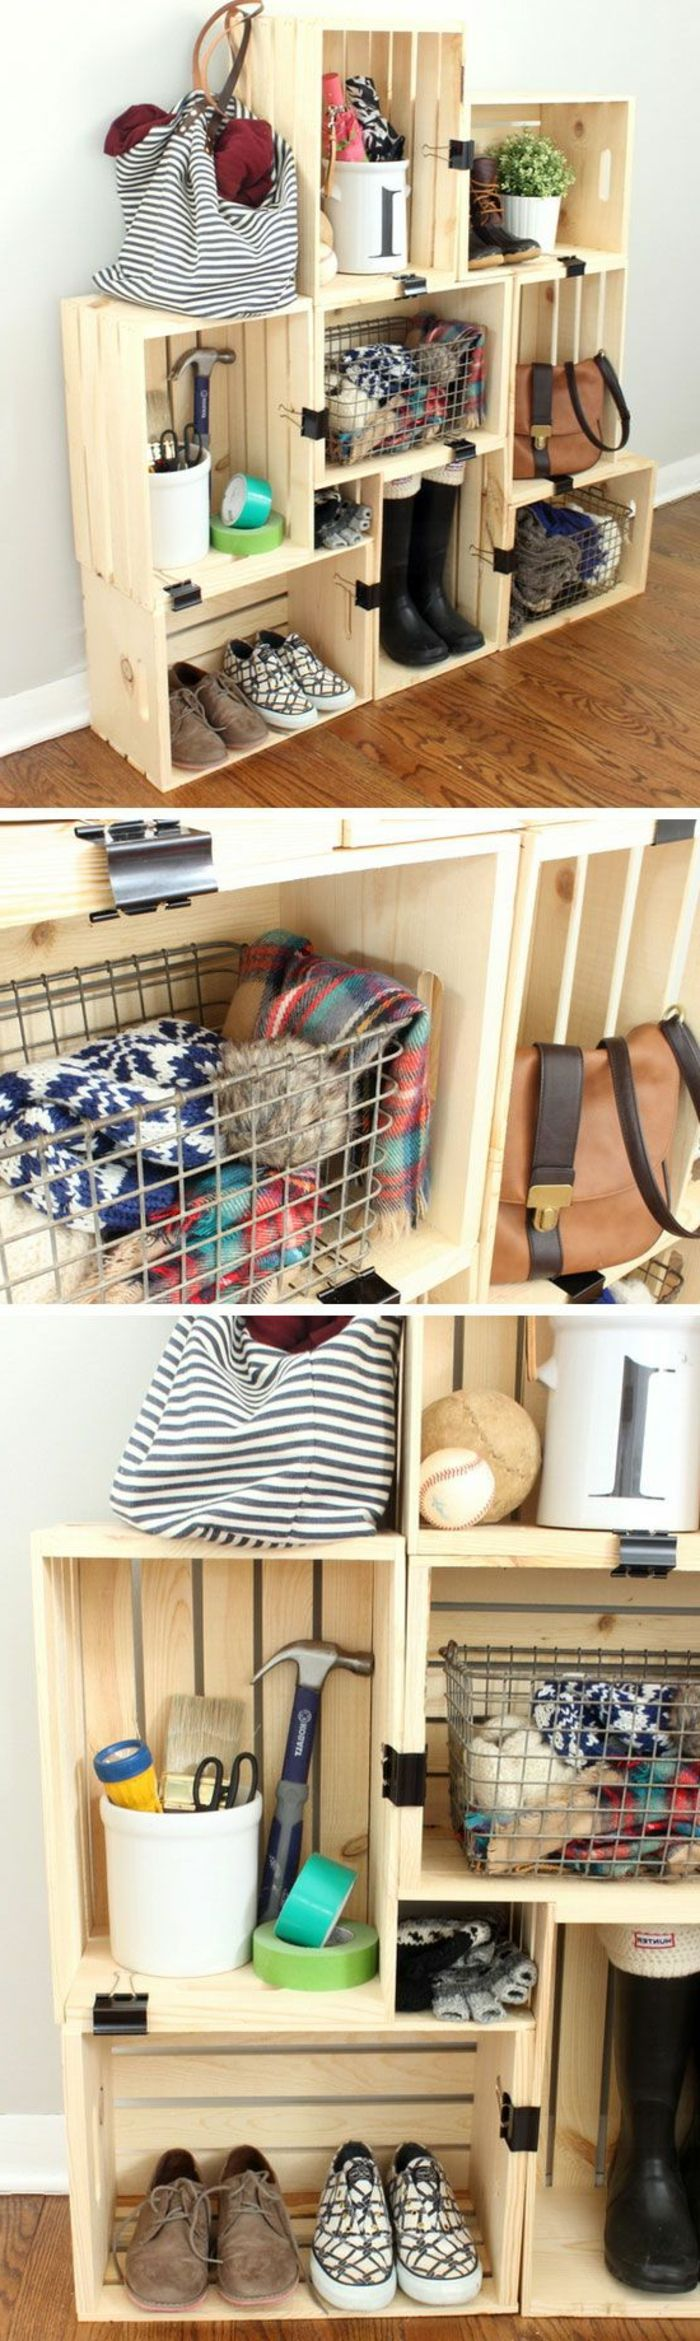 cagette en bois ikea acheter meilleur devrait bambou tagres ikea tagres racks cuisine bois. Black Bedroom Furniture Sets. Home Design Ideas